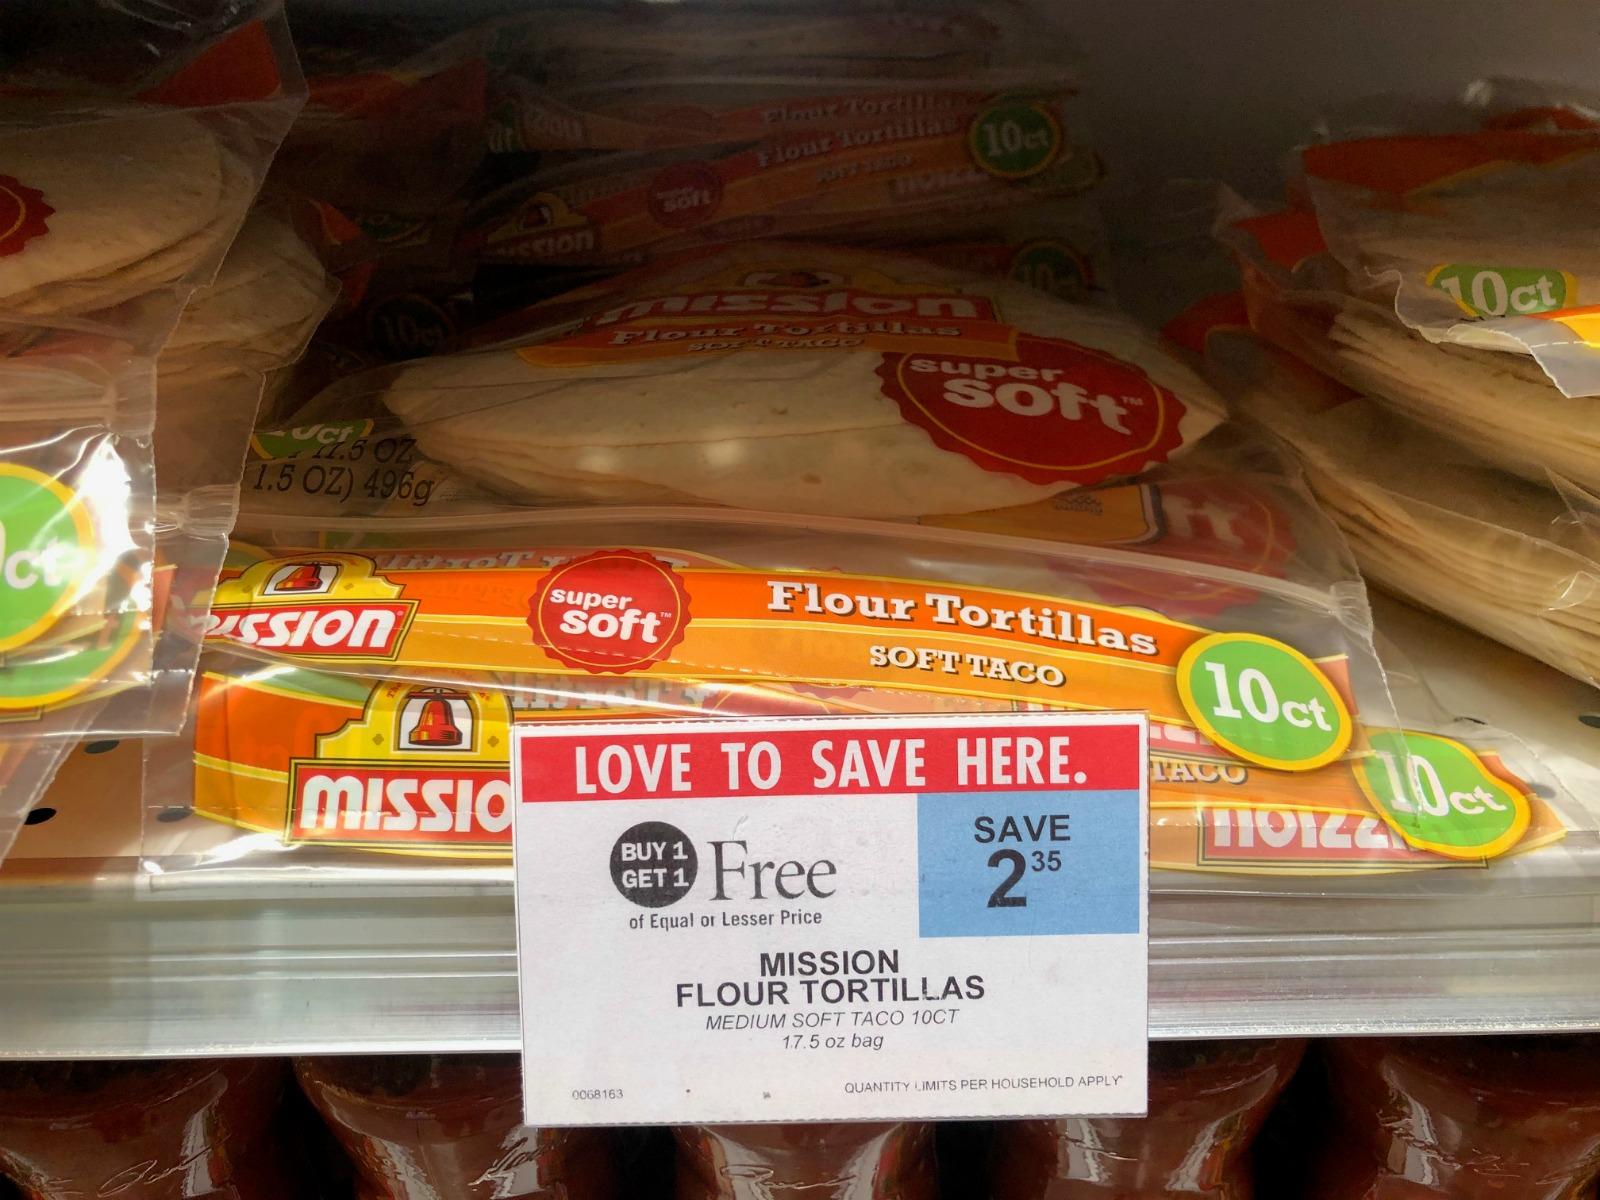 New A1A Marathon Coupons - Super Deal On Mission Tortillas This Week At Publix on I Heart Publix 1